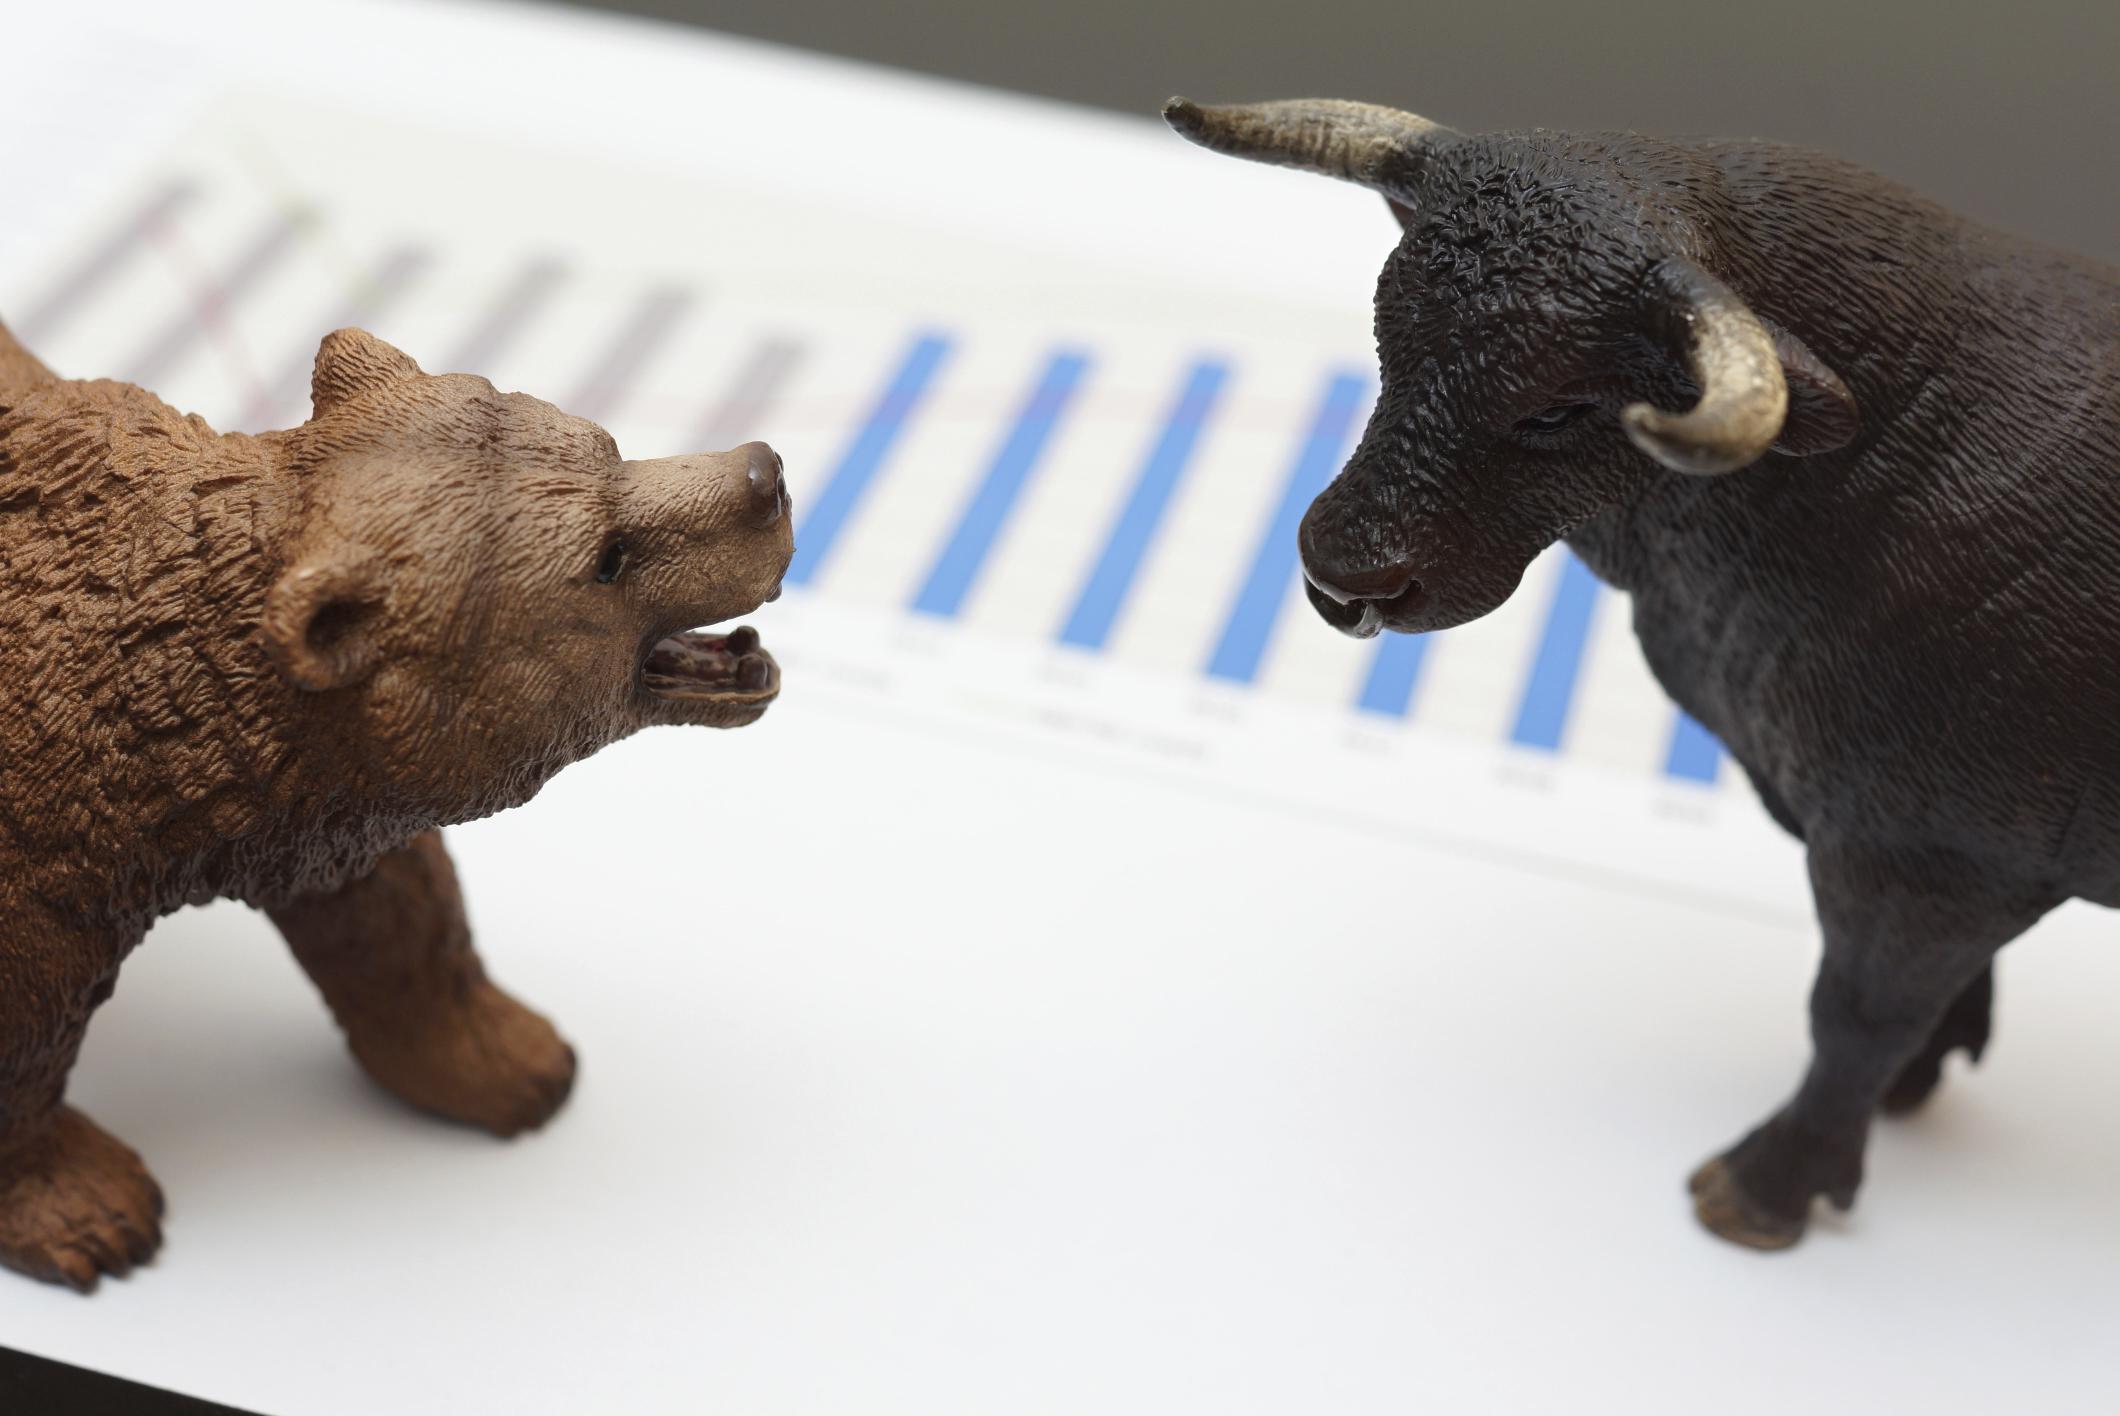 Bear figurine roaring at a bull